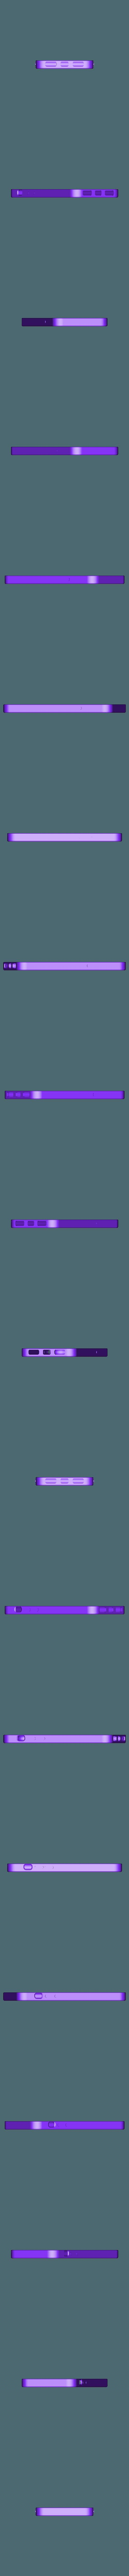 iphone11Pro_bumper.stl Download free STL file iPhone 11 Pro Bumper Case • 3D printer model, Adafruit